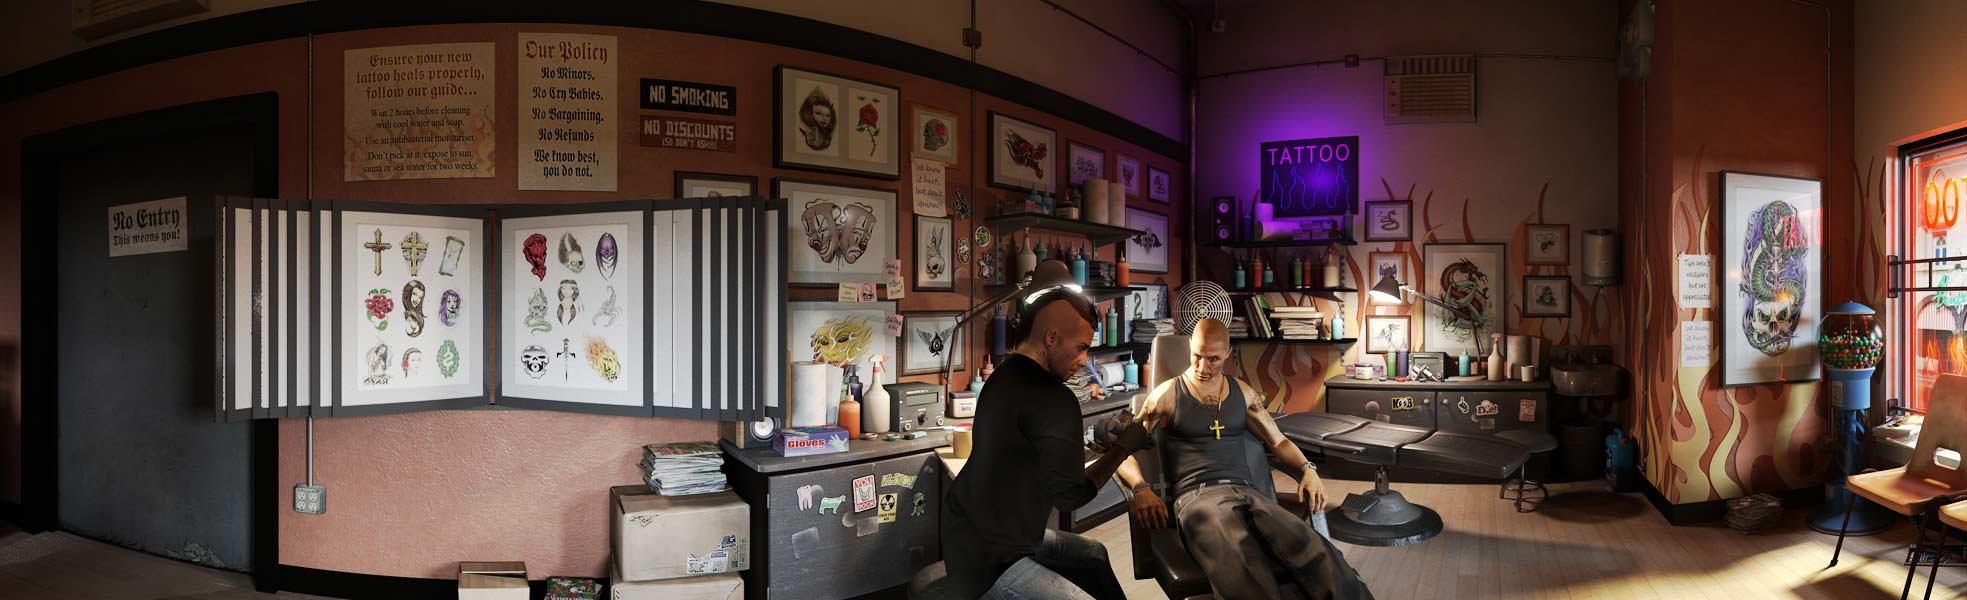 News gta v yoga is um megagames for Tattoo shop games